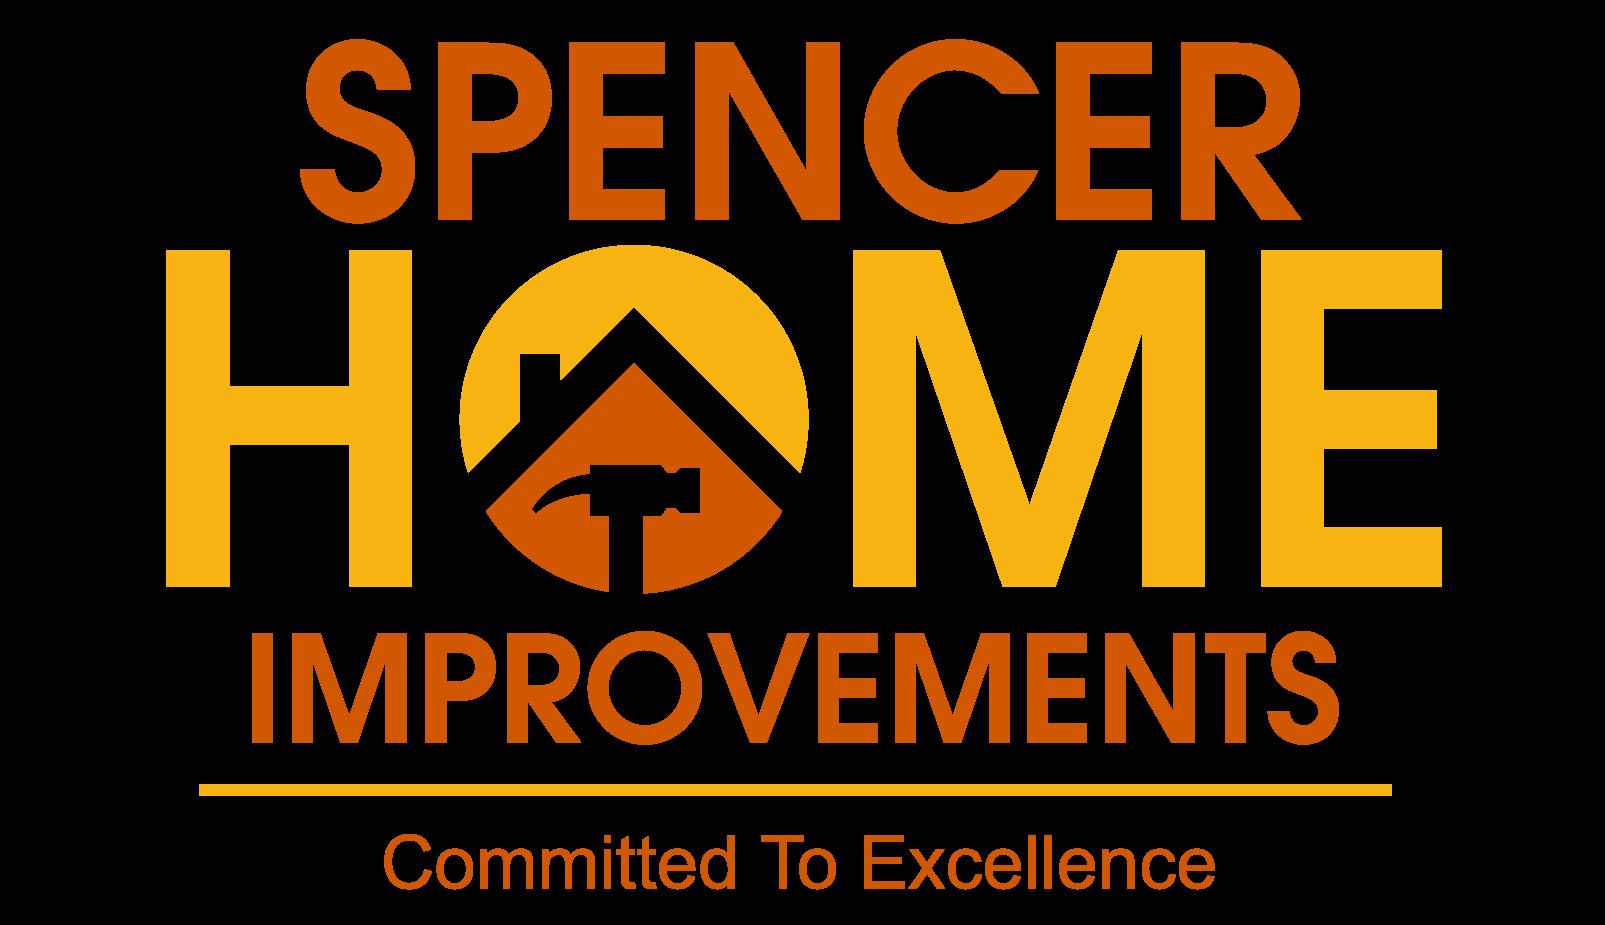 Spencer Home Improvements